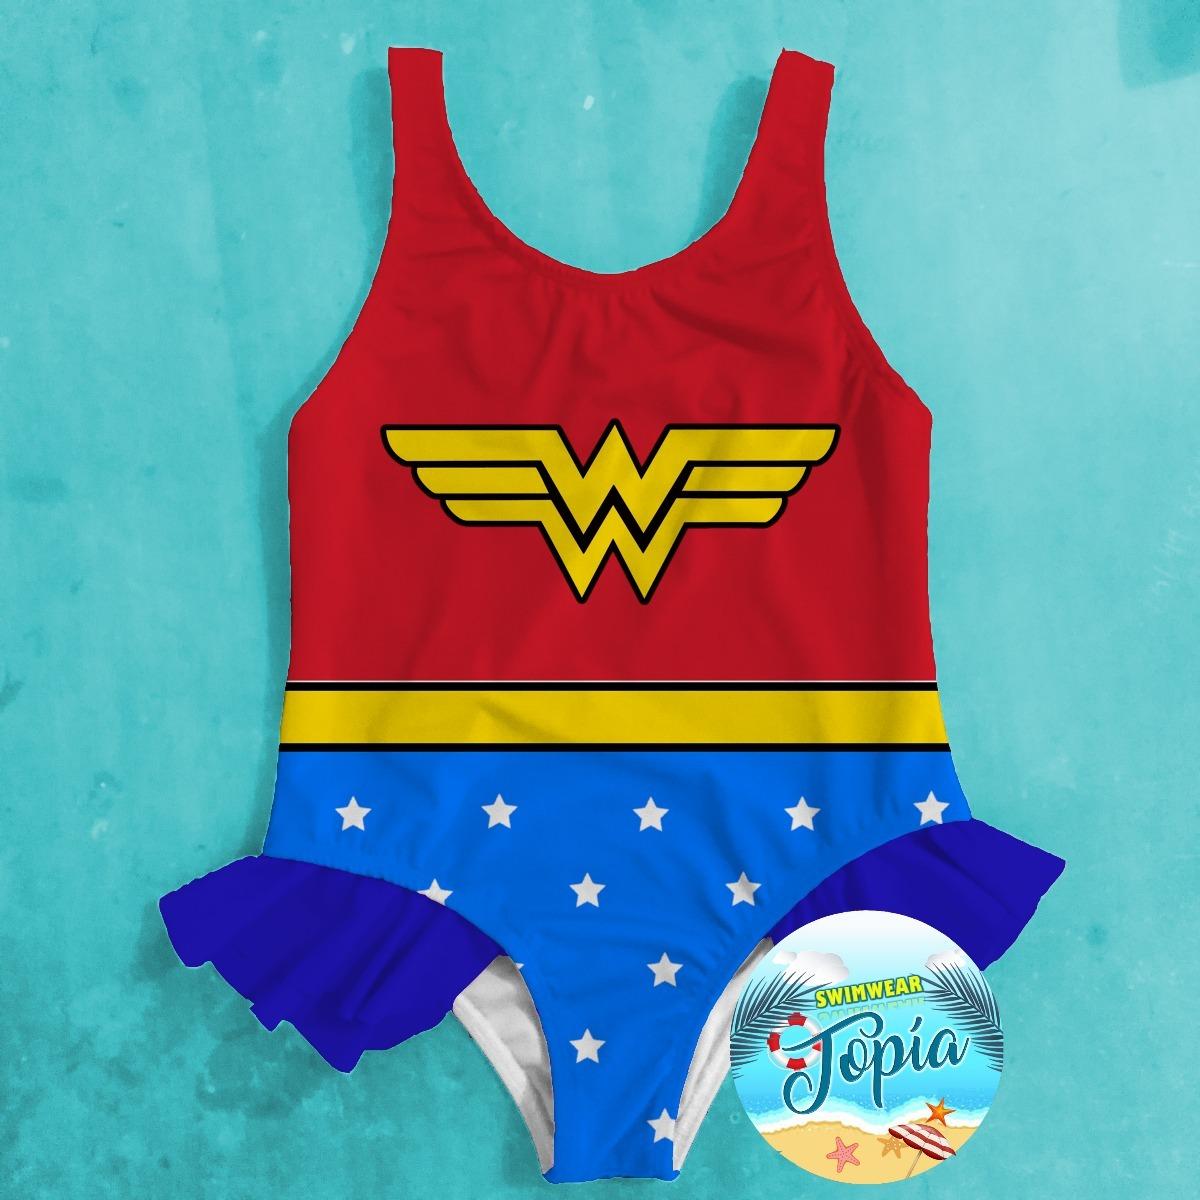 Girl Traje Vestido Niña Maravilla Superhero Mujer De Baño hBsQorxdtC